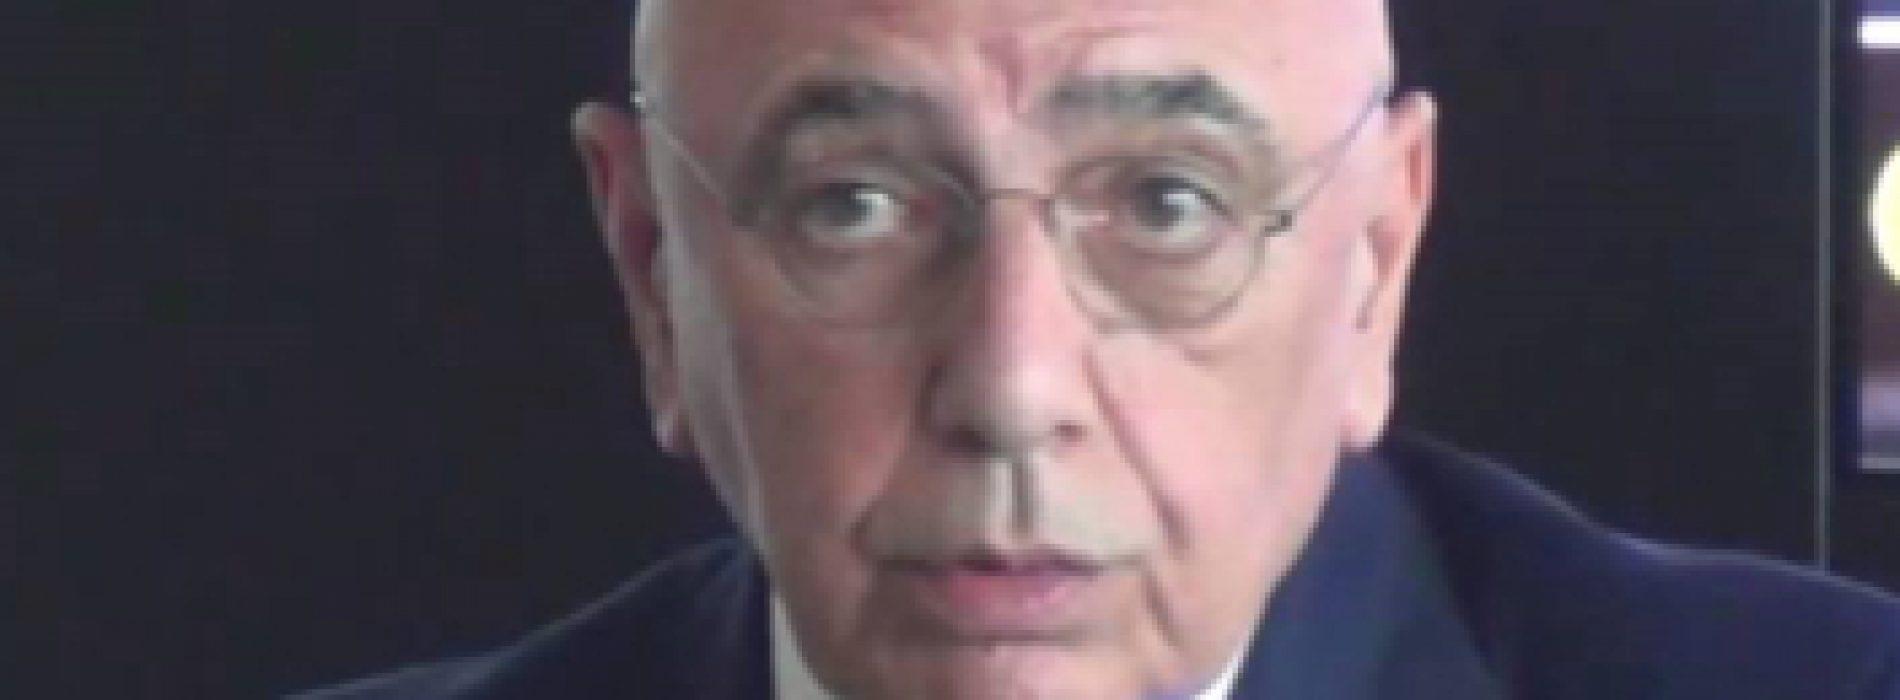 "Monza, Galliani: ""Boateng perfetto, gli mandavo canzoni d'amore"""